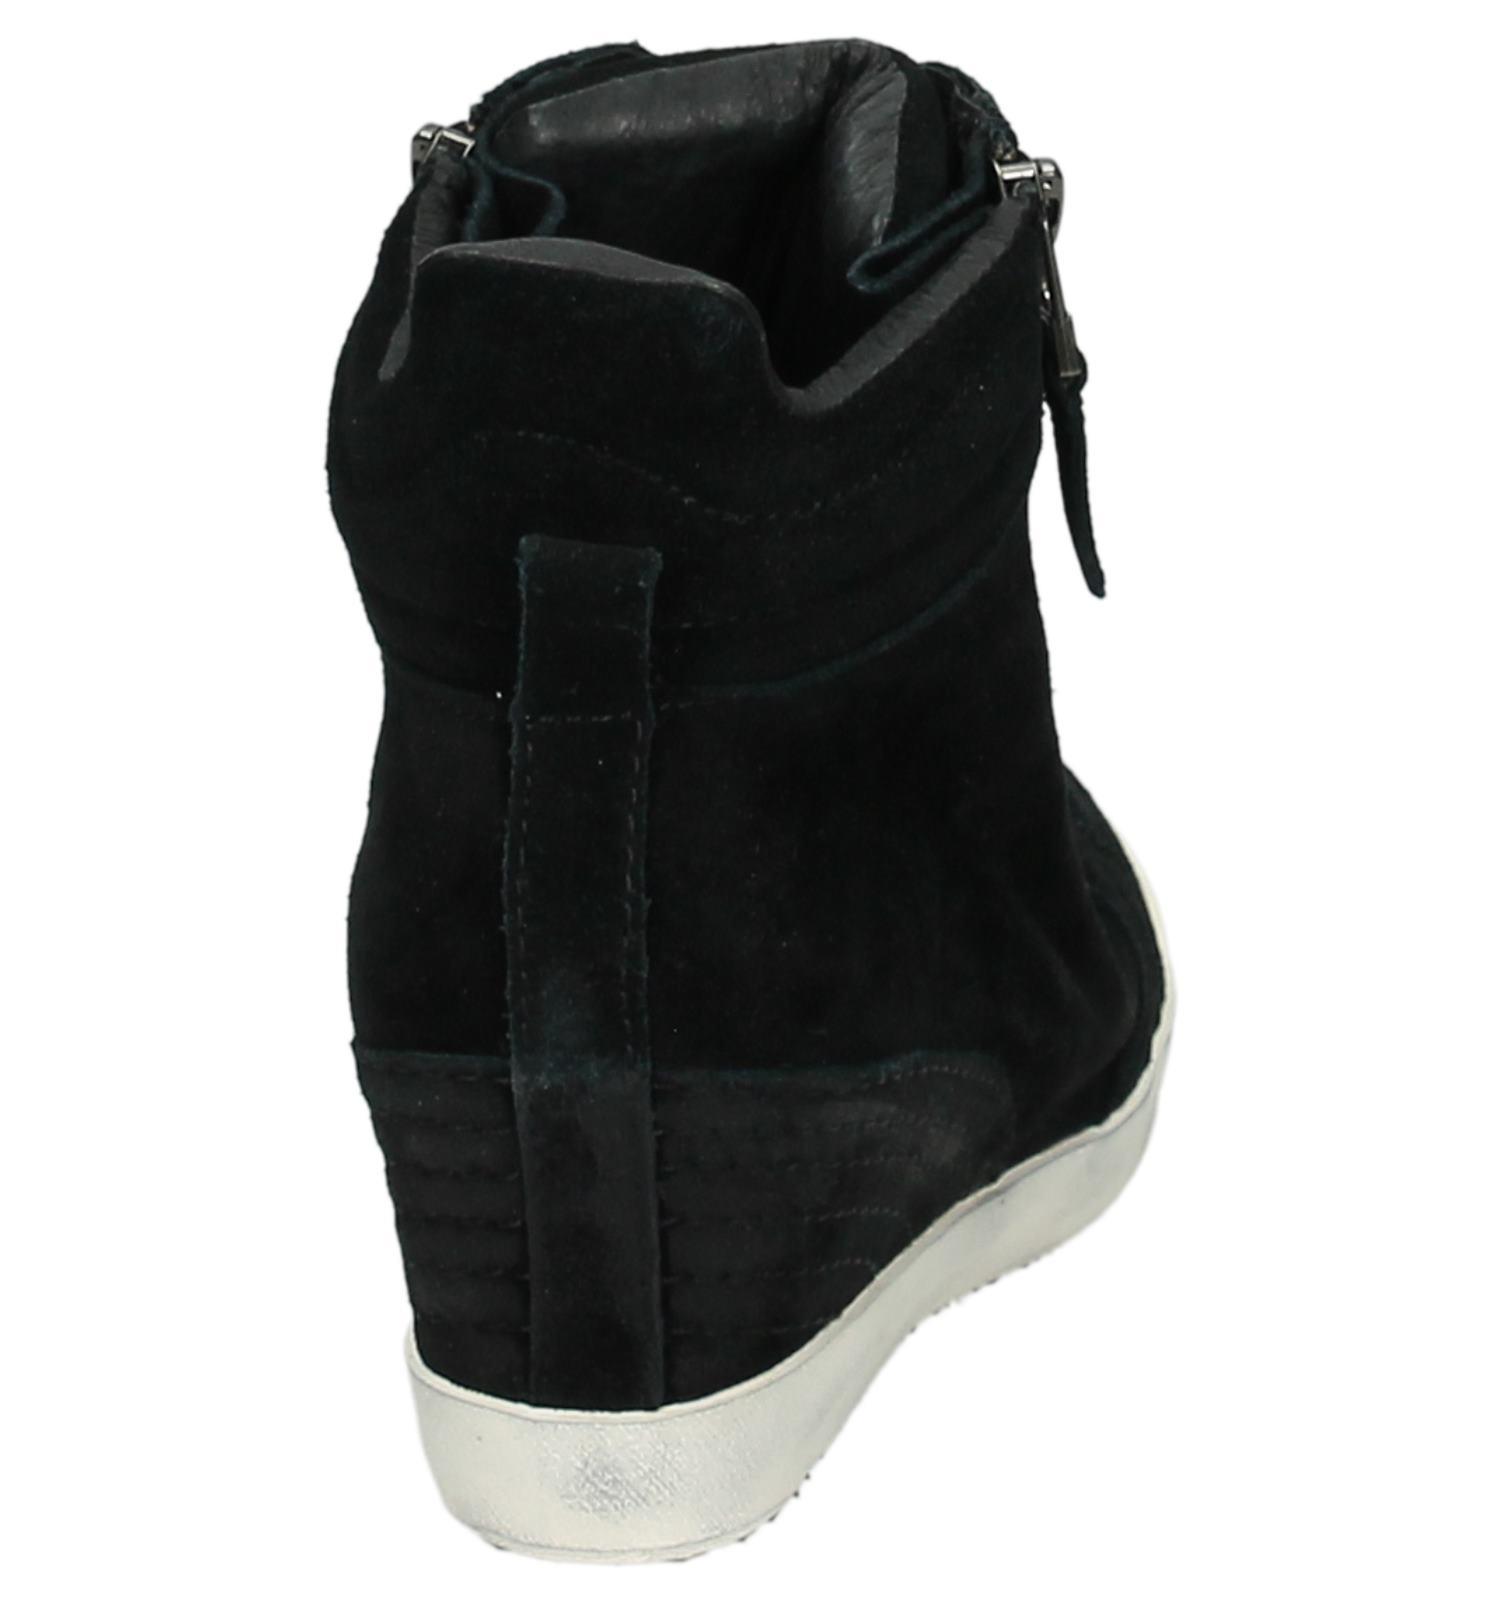 23edce4d59f Sneaker met Sleehak Zwart Newblue | TORFS.BE | Gratis verzend en retour